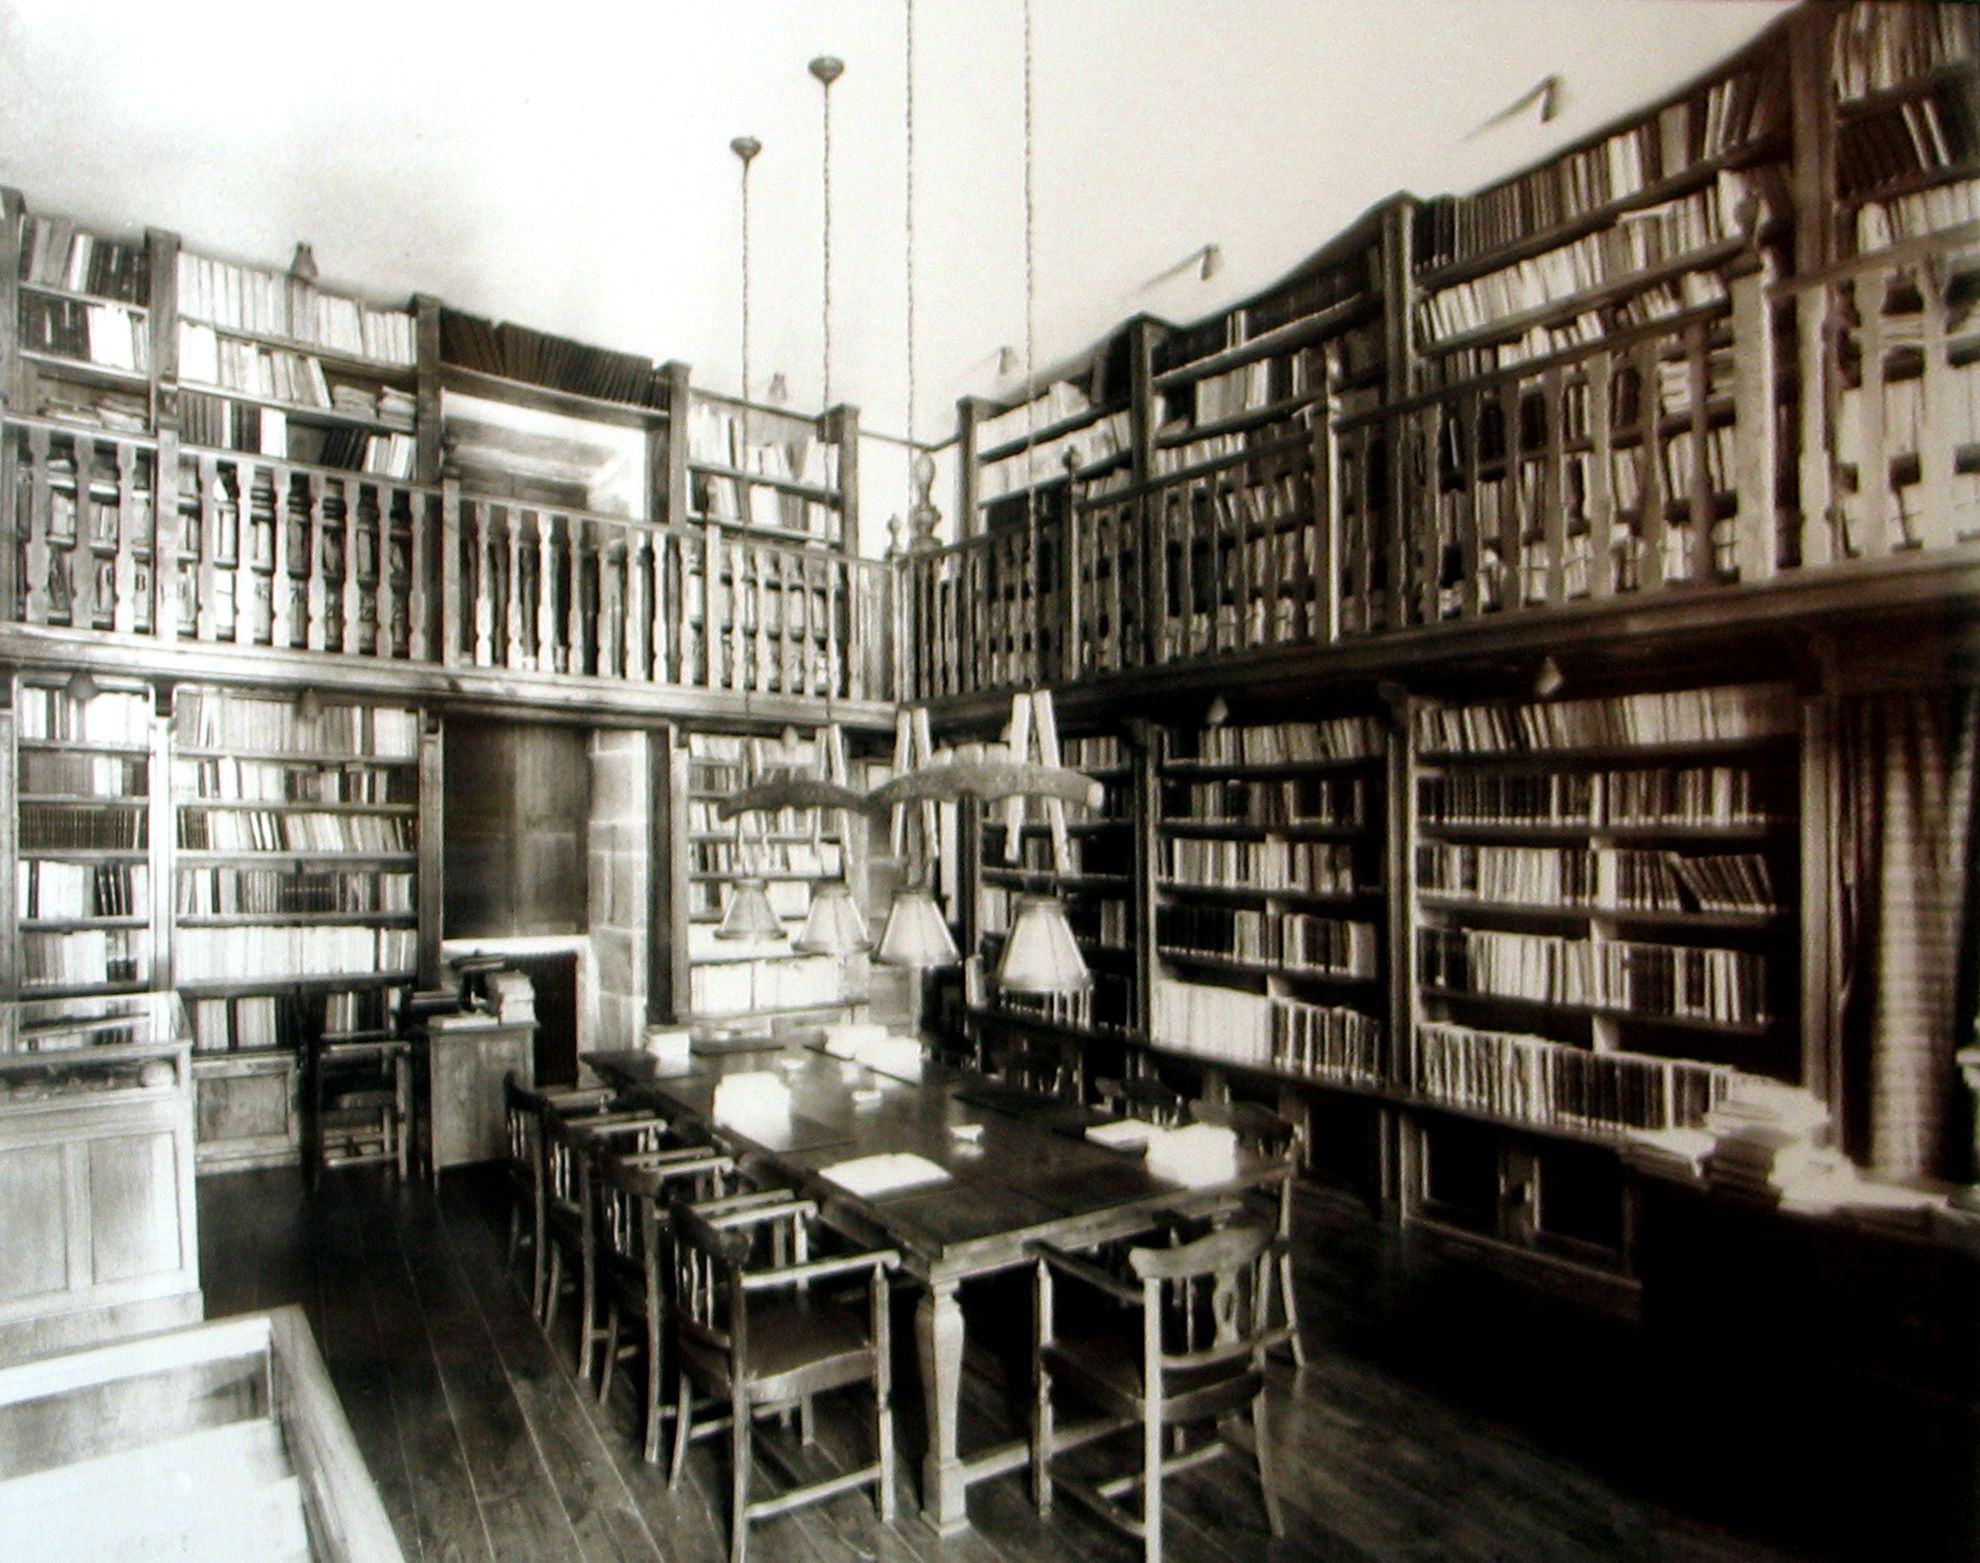 biblioteca antigua sede | Santiago. Fotos antiguas | Pinterest ...